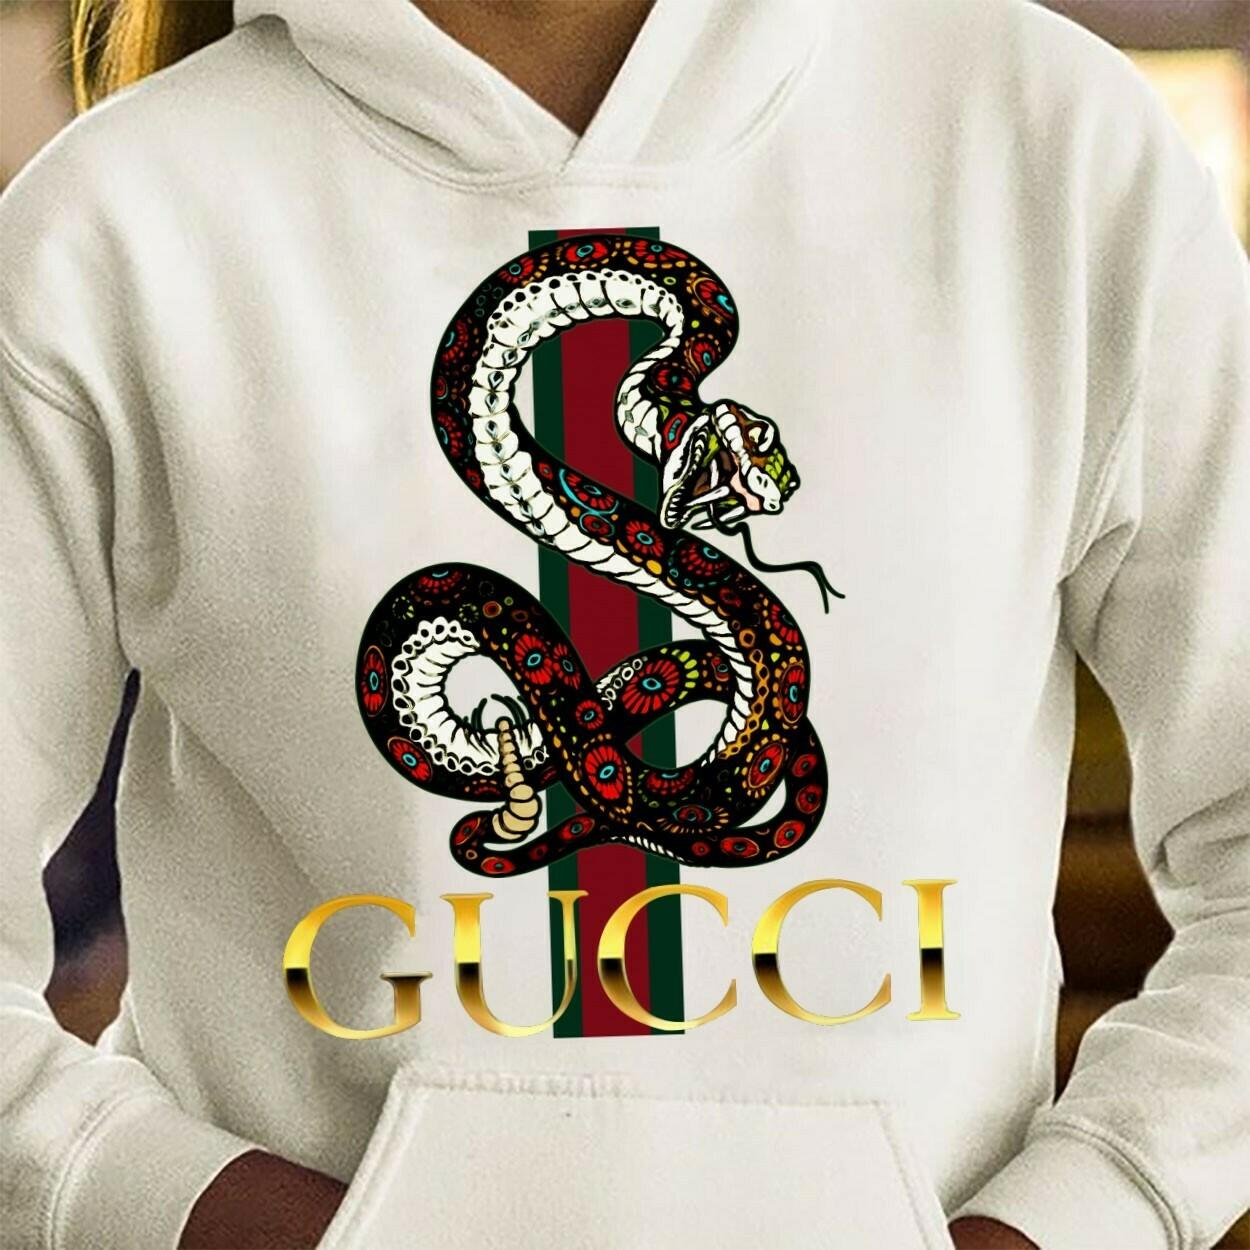 Classic Logo Snake Supreme Louis Vuitton Shirt LV T-shirt Louis Vuitton Fashion LV Fashion Shirts for Women Men Youth Kids Vintage T Shirt Long Sleeve Sweatshirt Hoodie Jolly Family Gifts